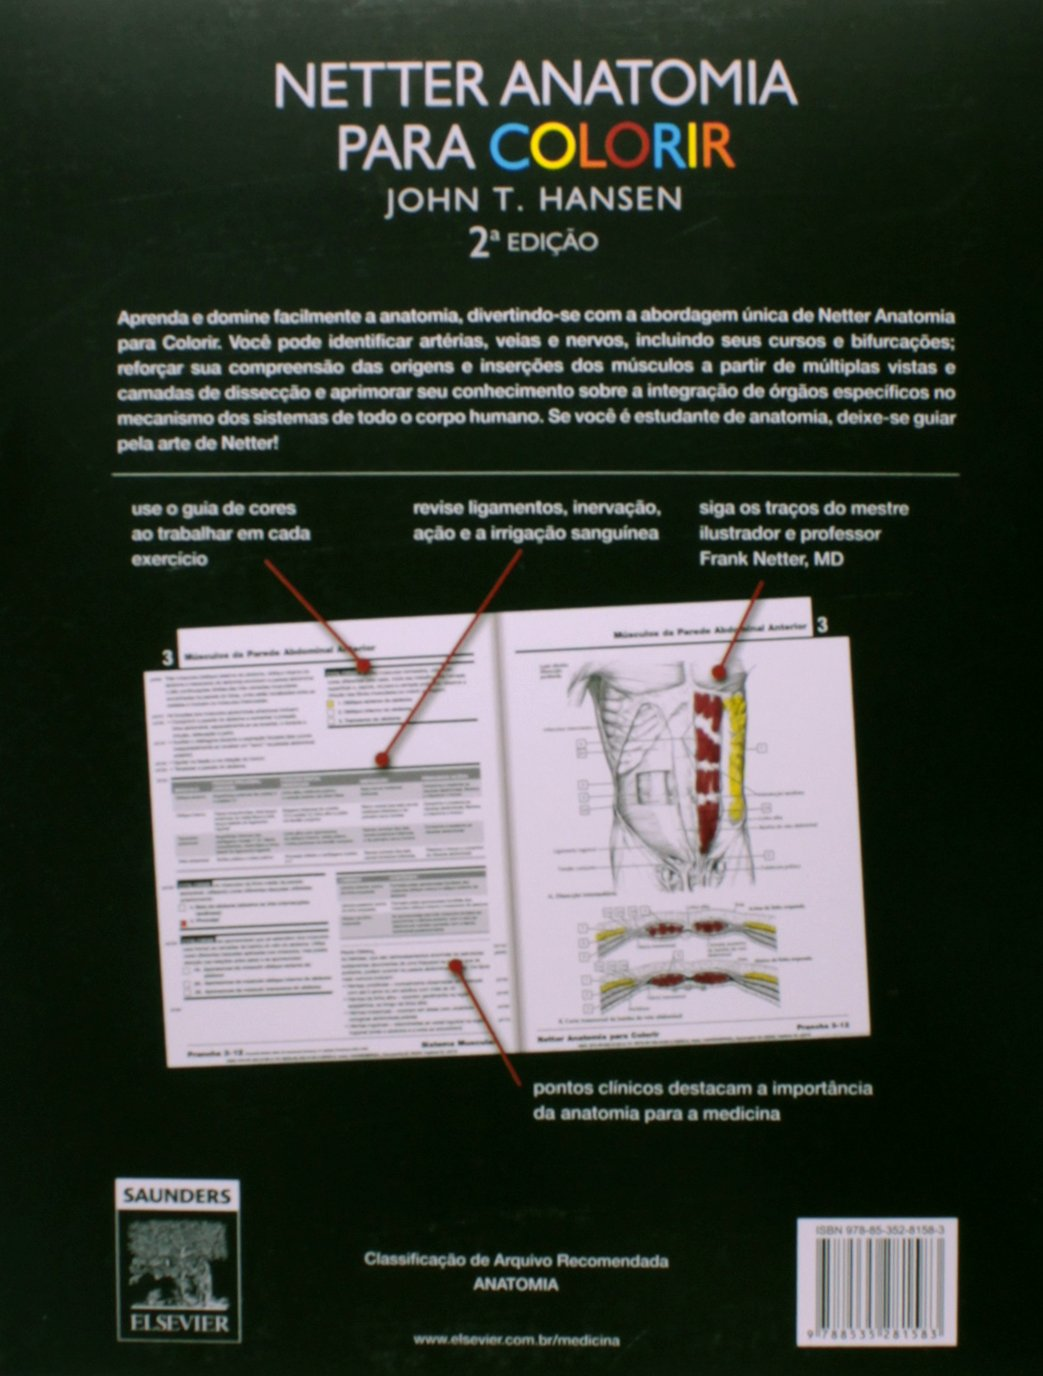 Netter. Anatomia Para Colorir Em Portuguese do Brasil: Amazon.es ...